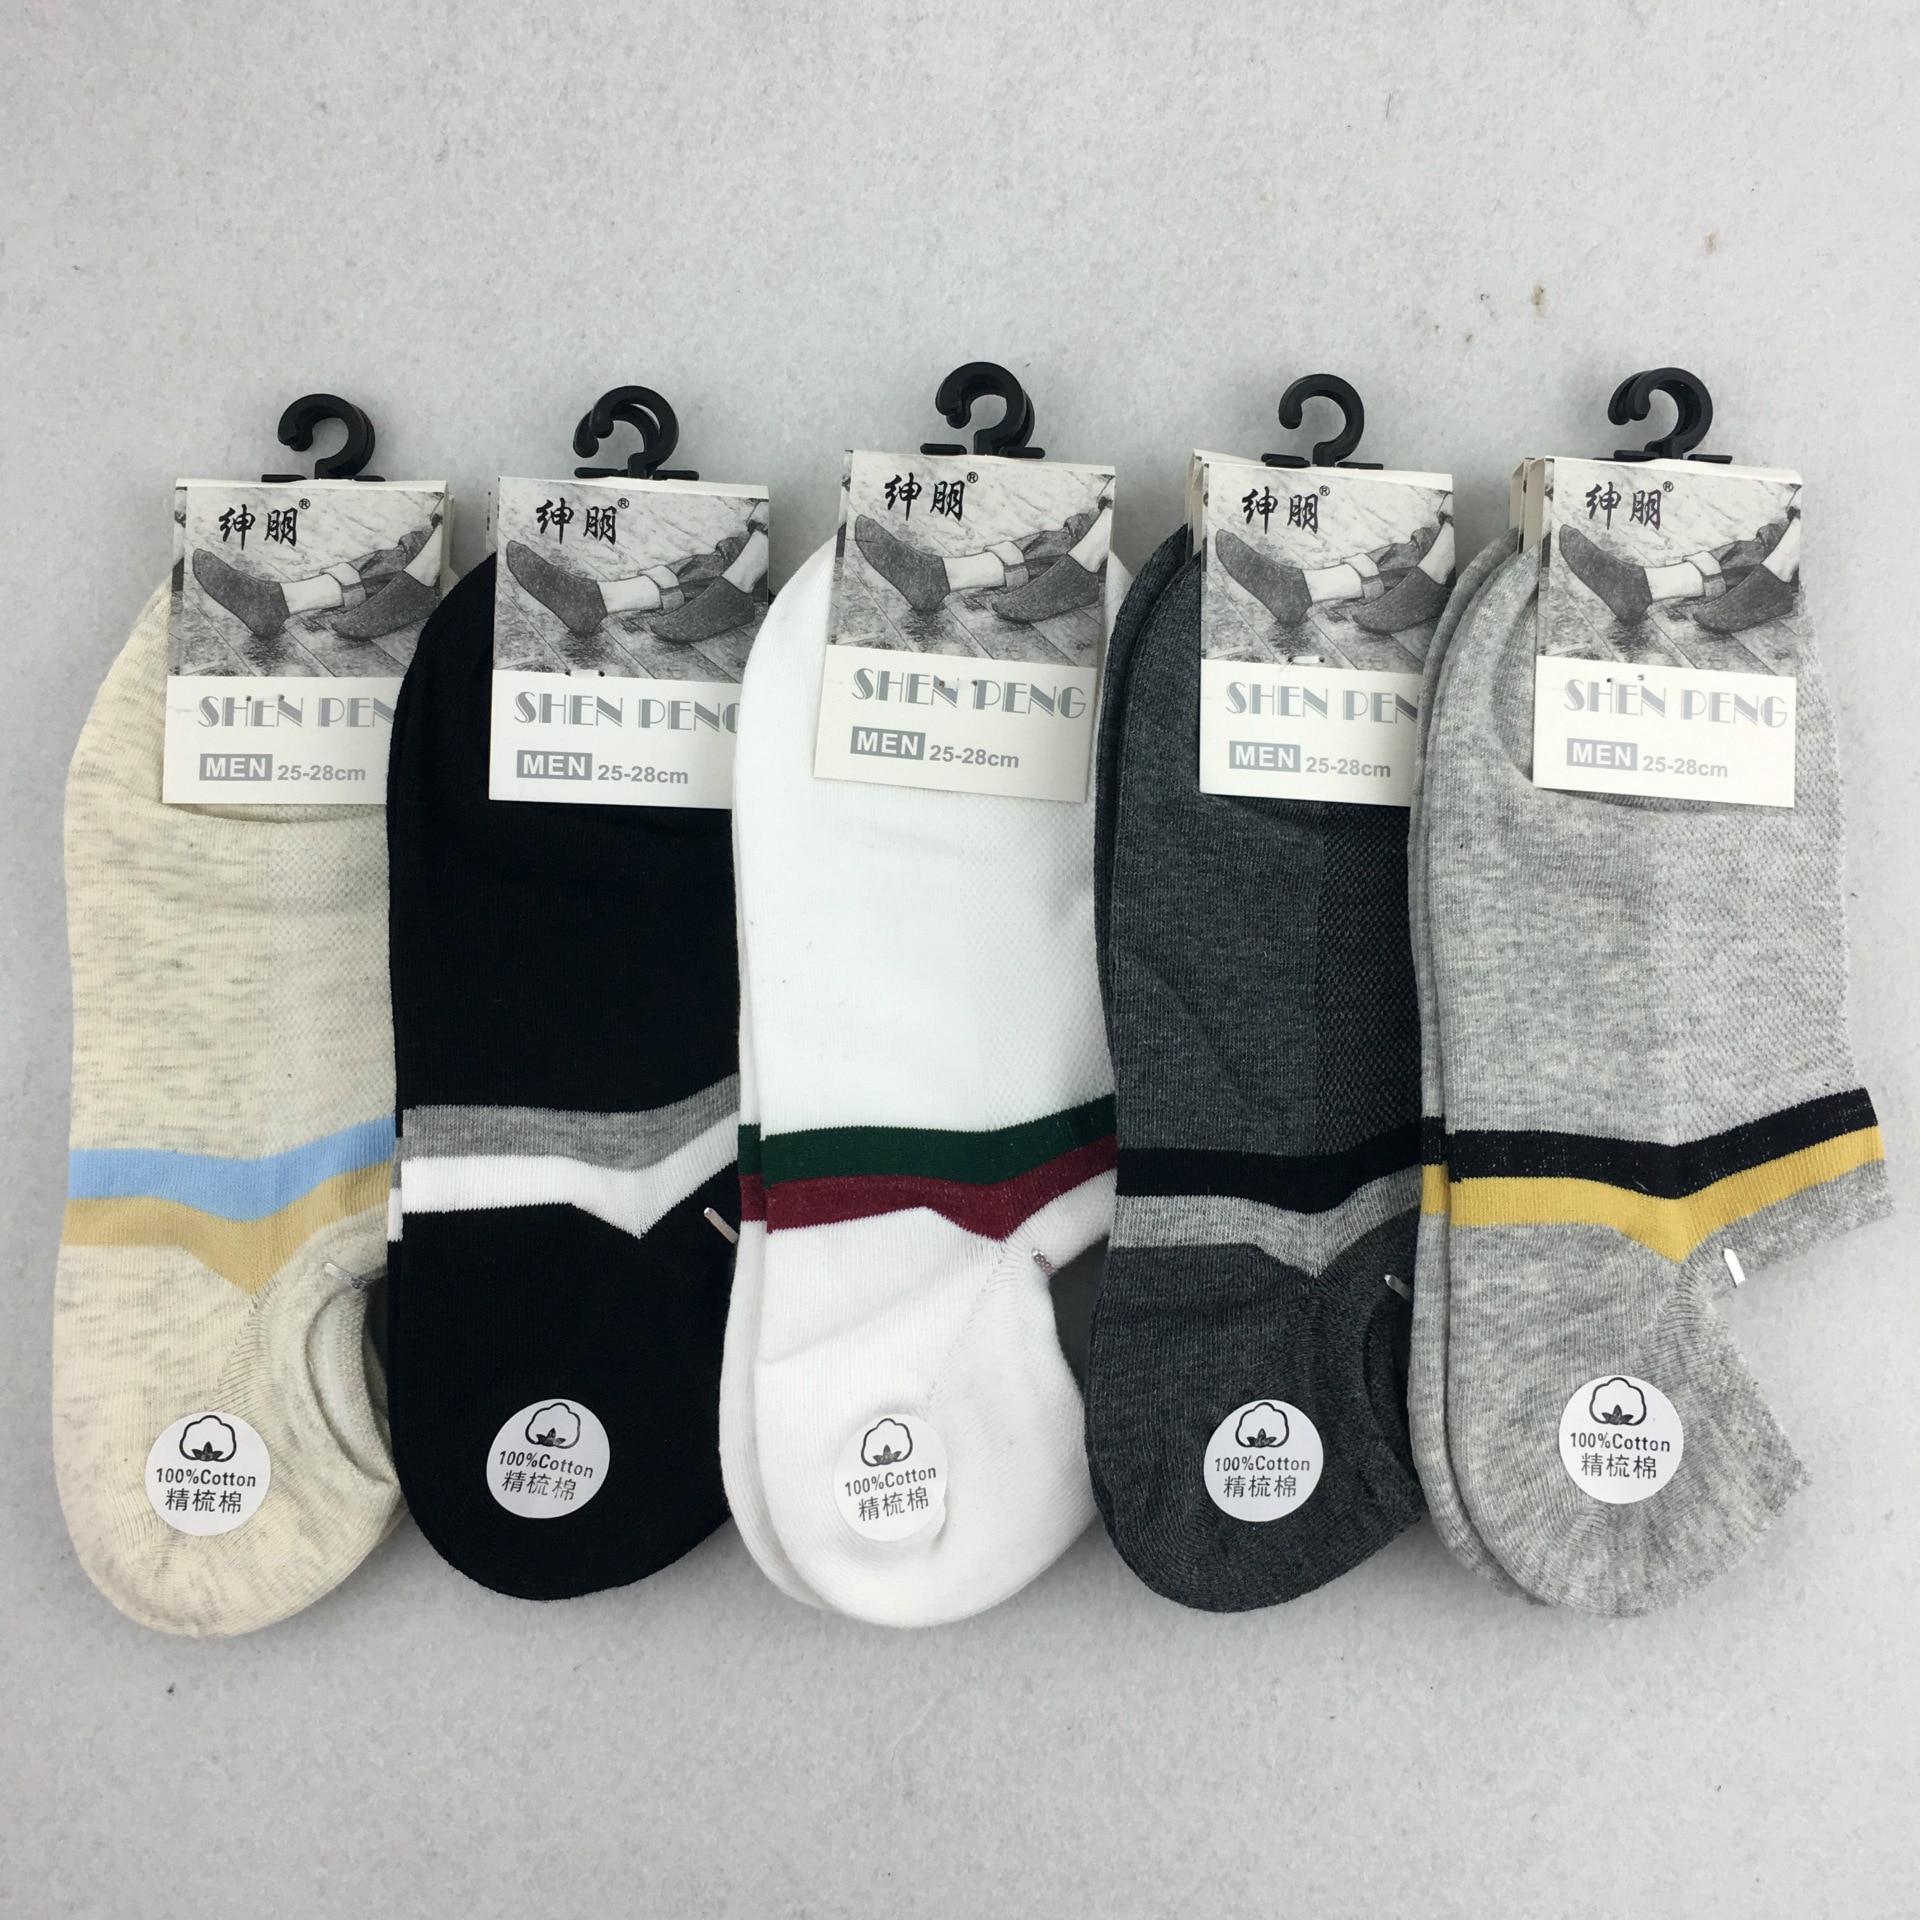 Men's Casual Boat Socks All Code Cotton Low Tube Casual Socks Mesh Shallow Mouth Men's Socks 5 Pairs